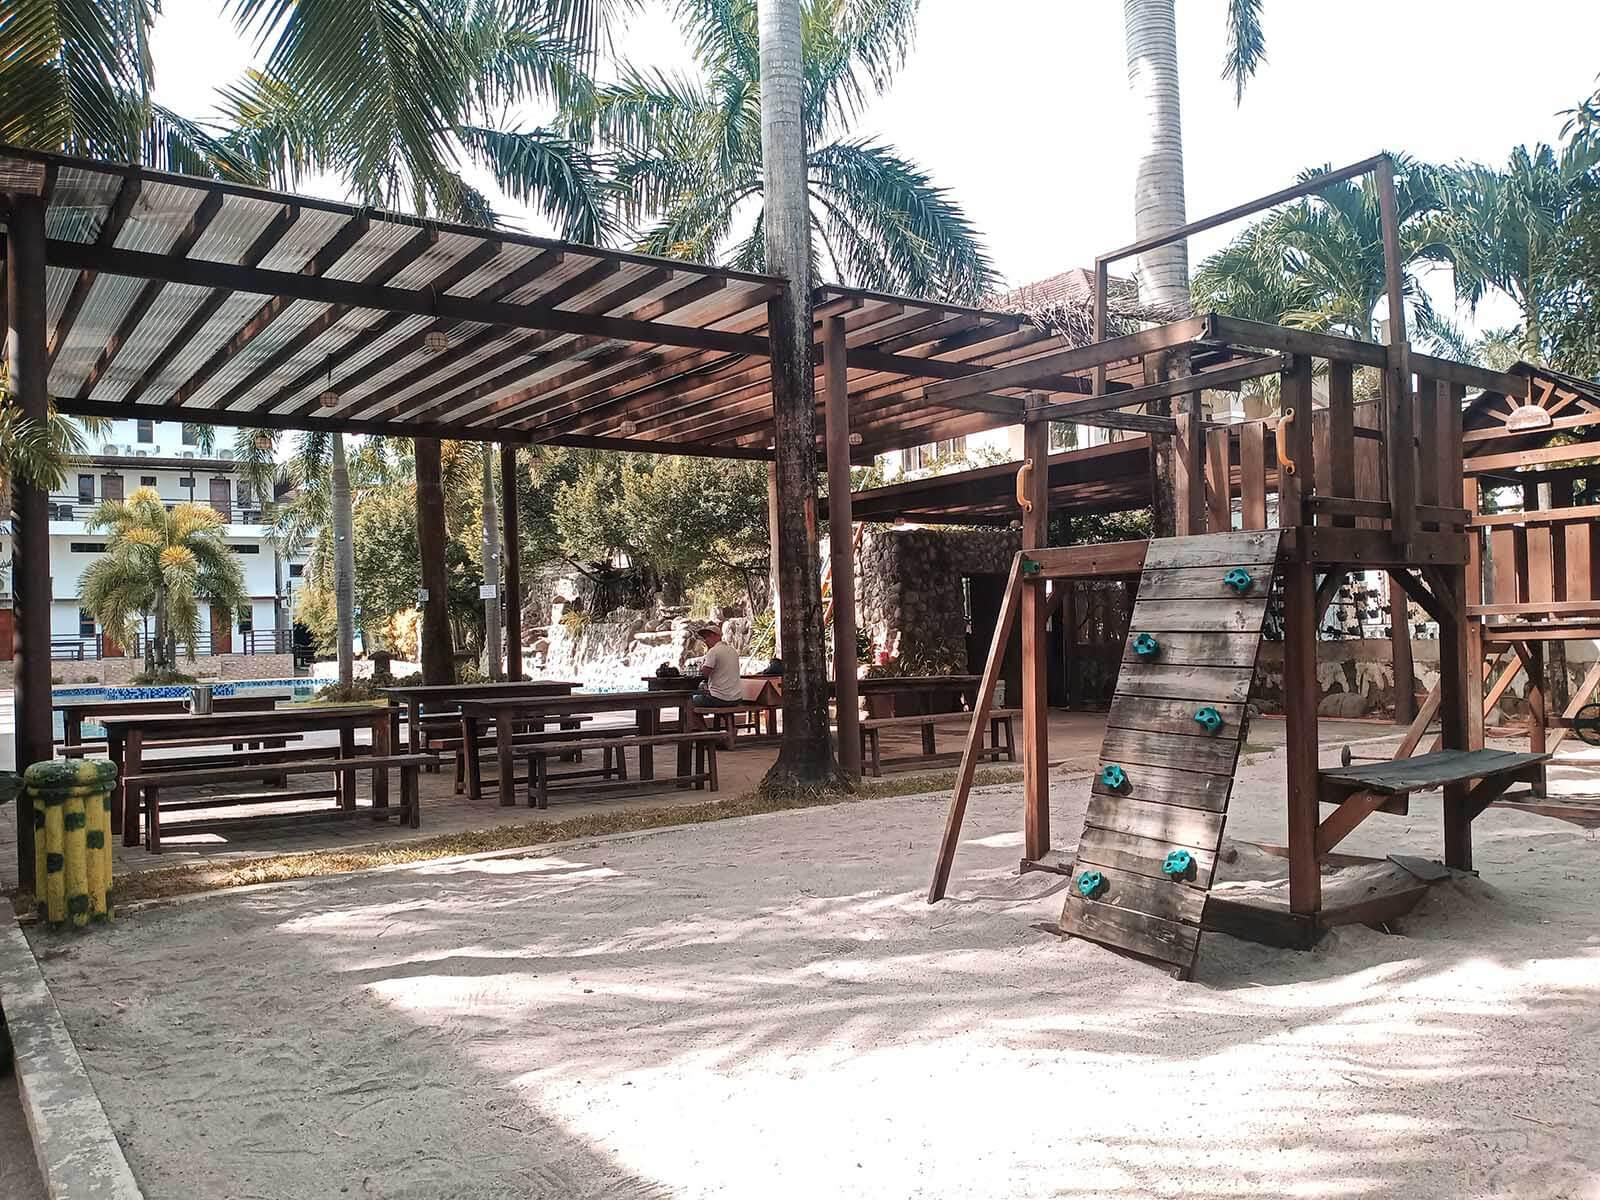 Morong Bataan Travel Guide - White Corals Beach Resort